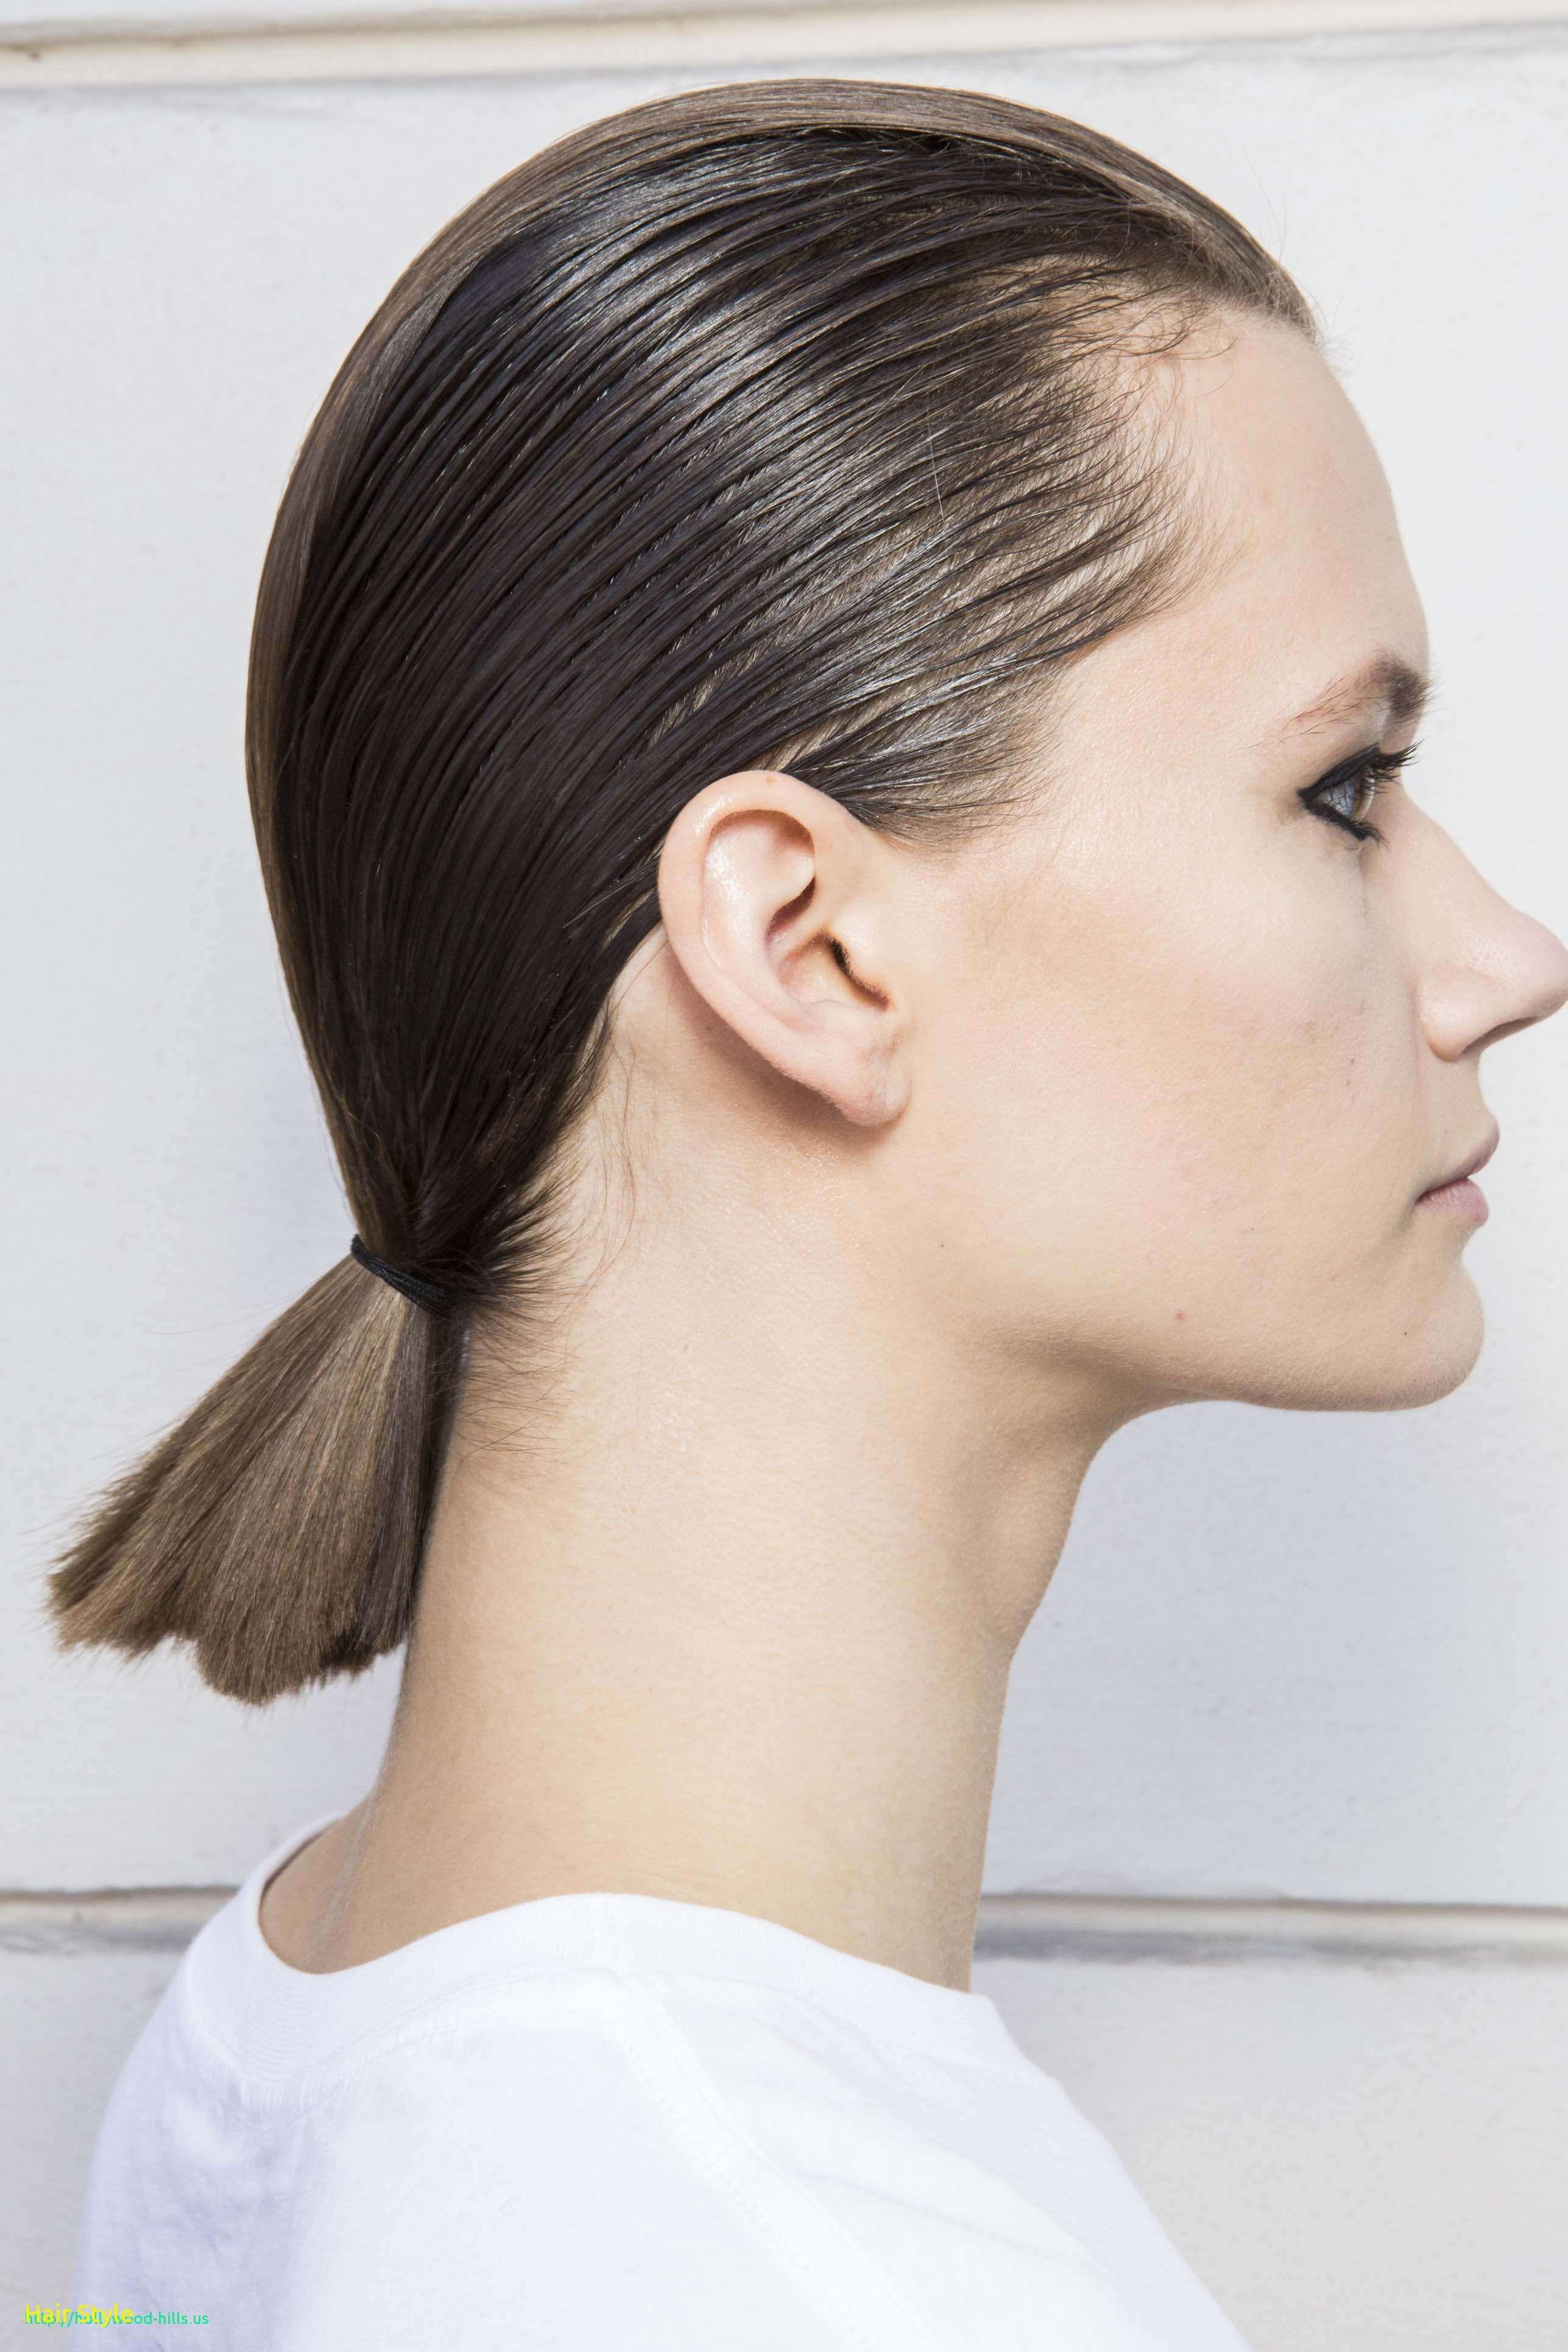 50++ Coiffure cheveux sales inspiration